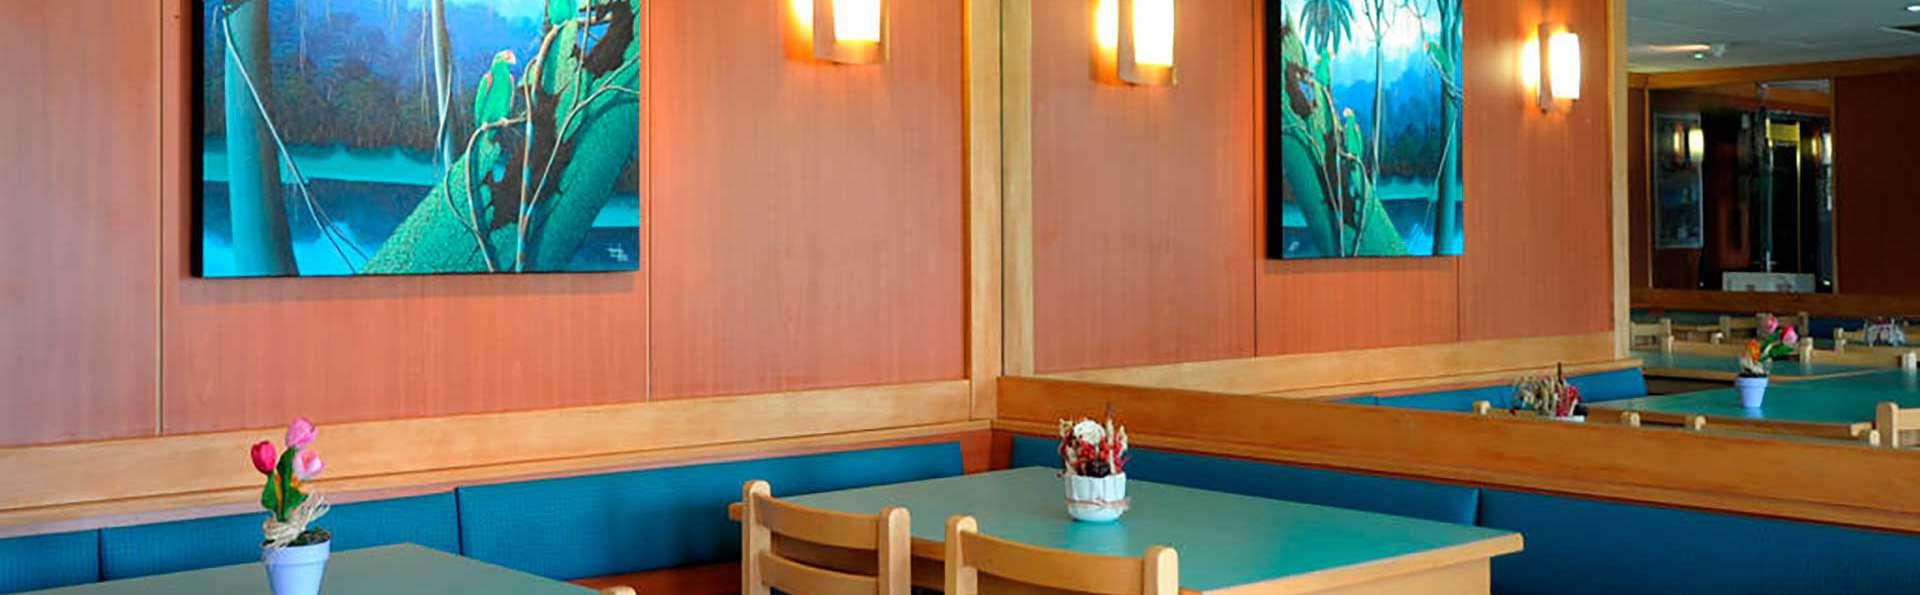 Hôtel Roi Soleil Colmar - Edit_Restaurant2.jpg